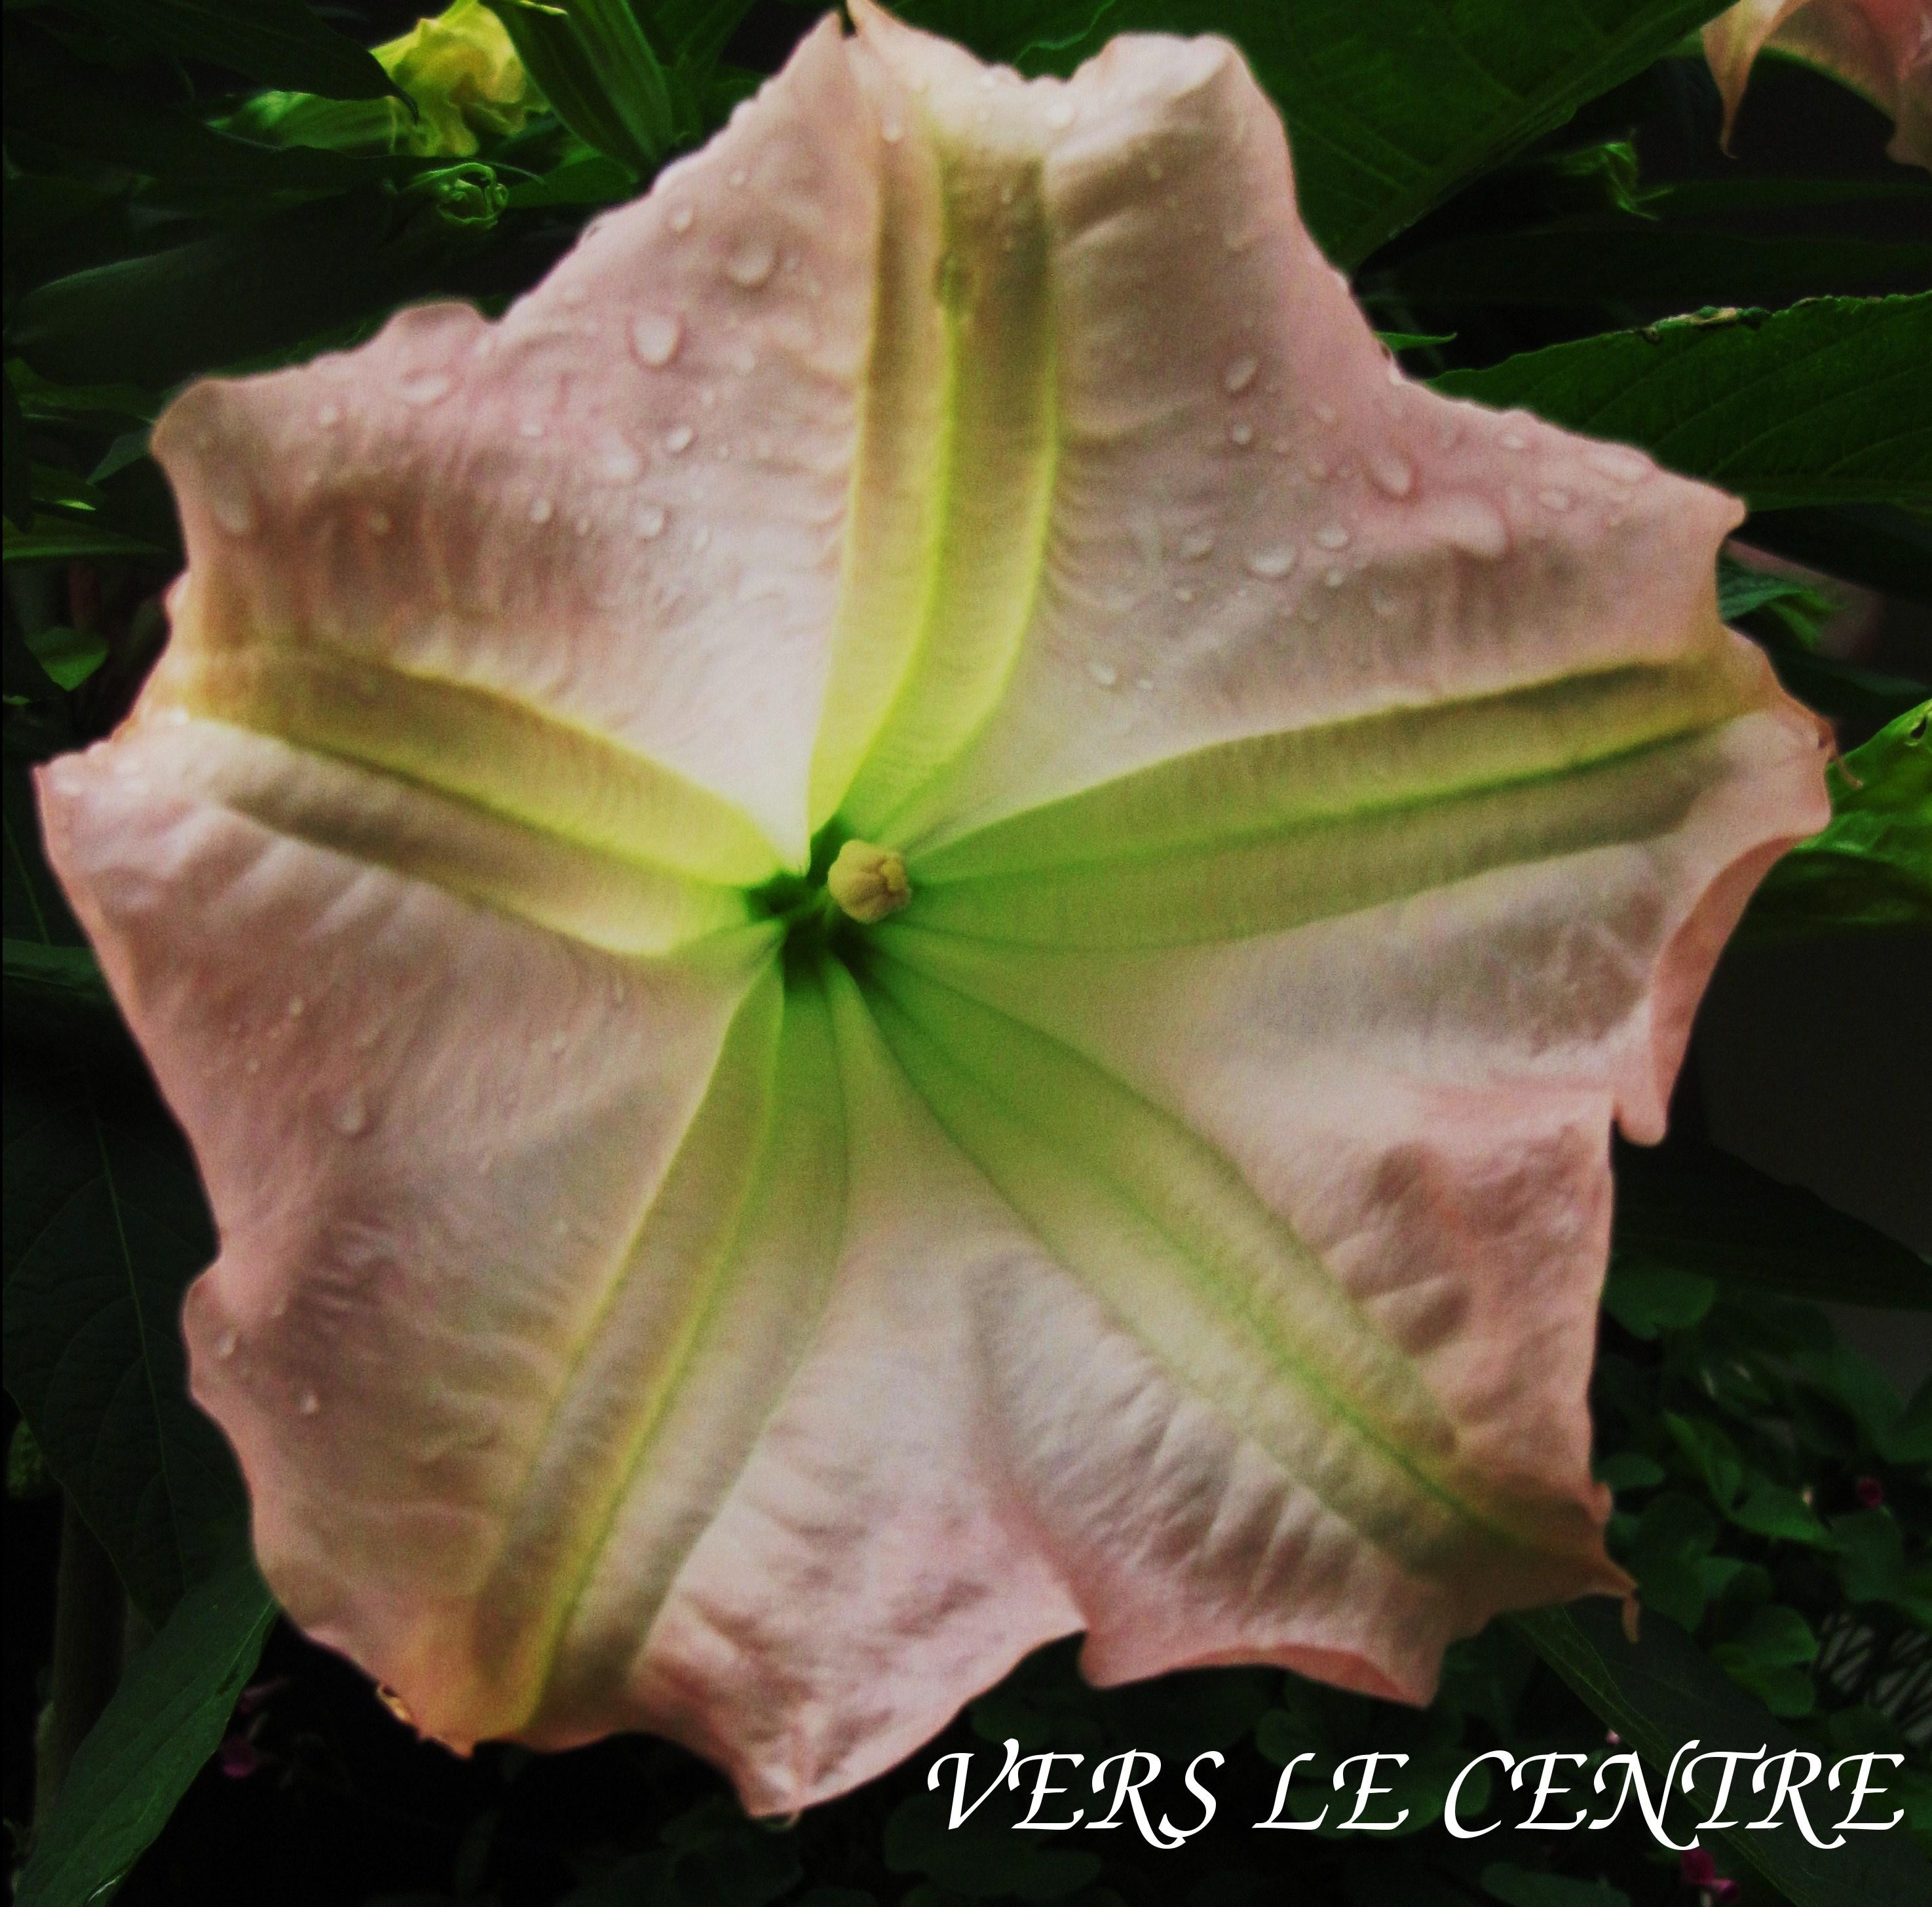 roses-doctobre-apres-la-pluie-012.JPG